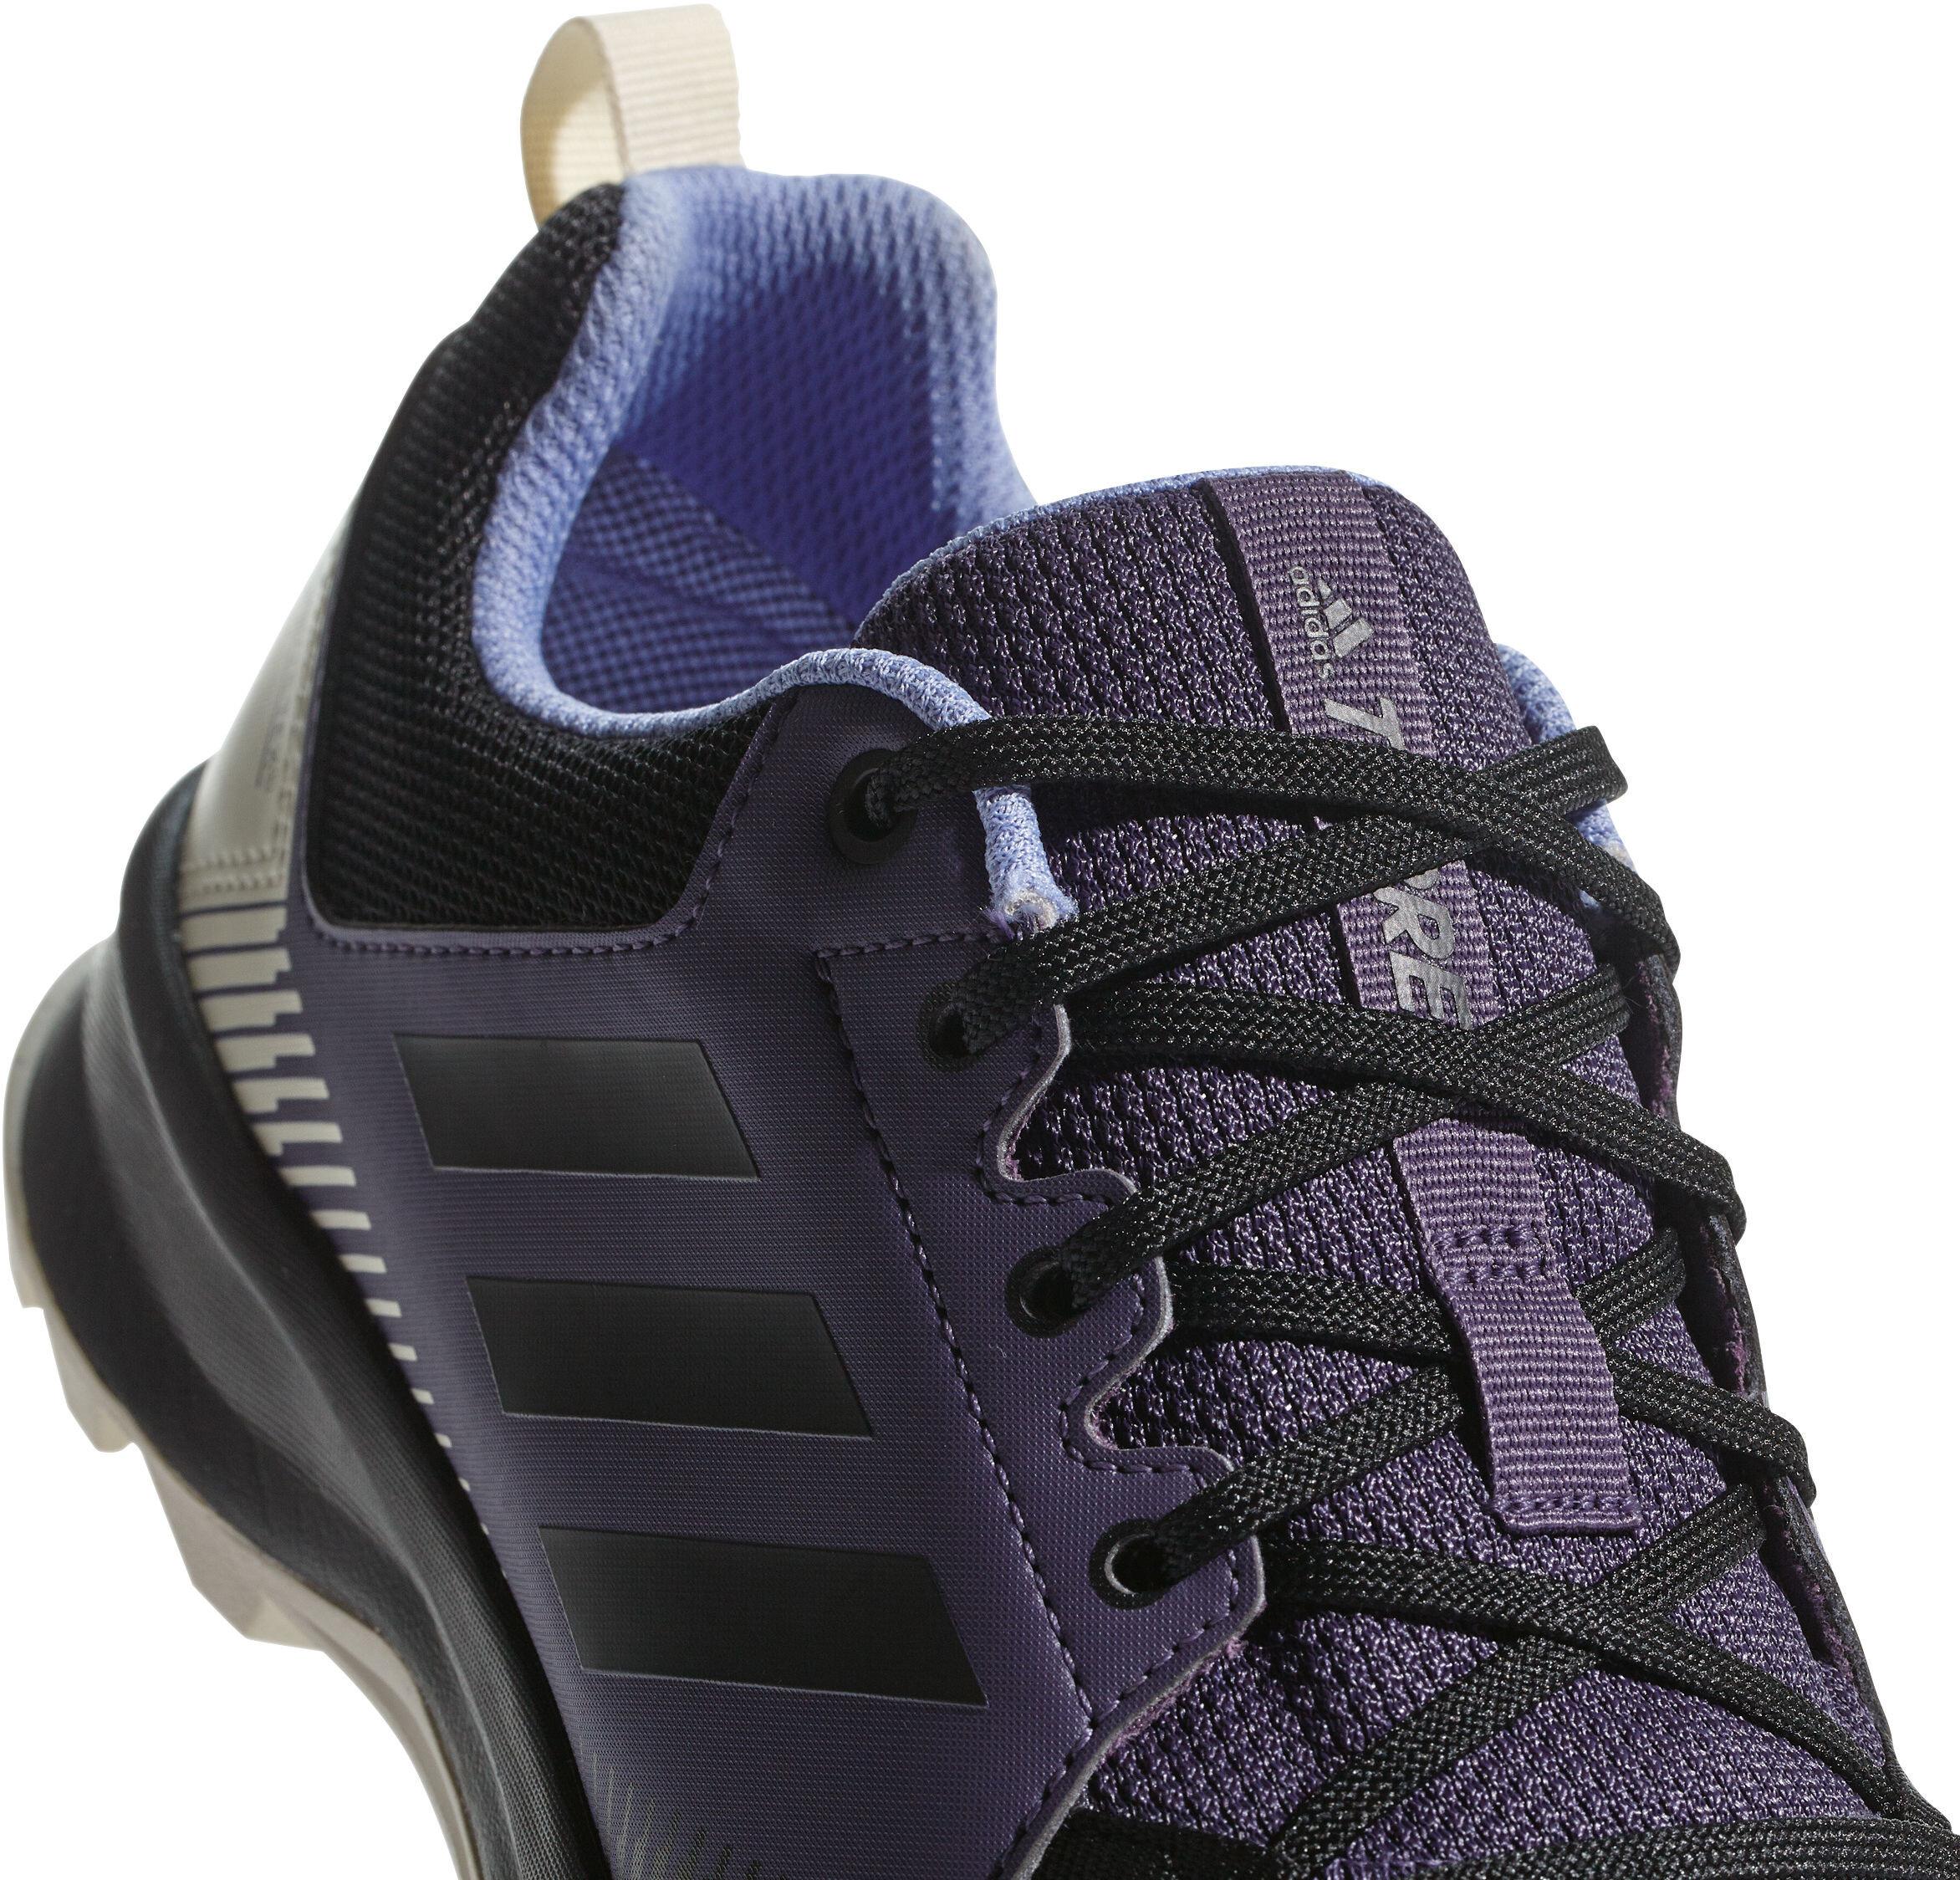 8c91d7a5dfa adidas TERREX Tracerocker GTX Shoes Women purple at Addnature.co.uk